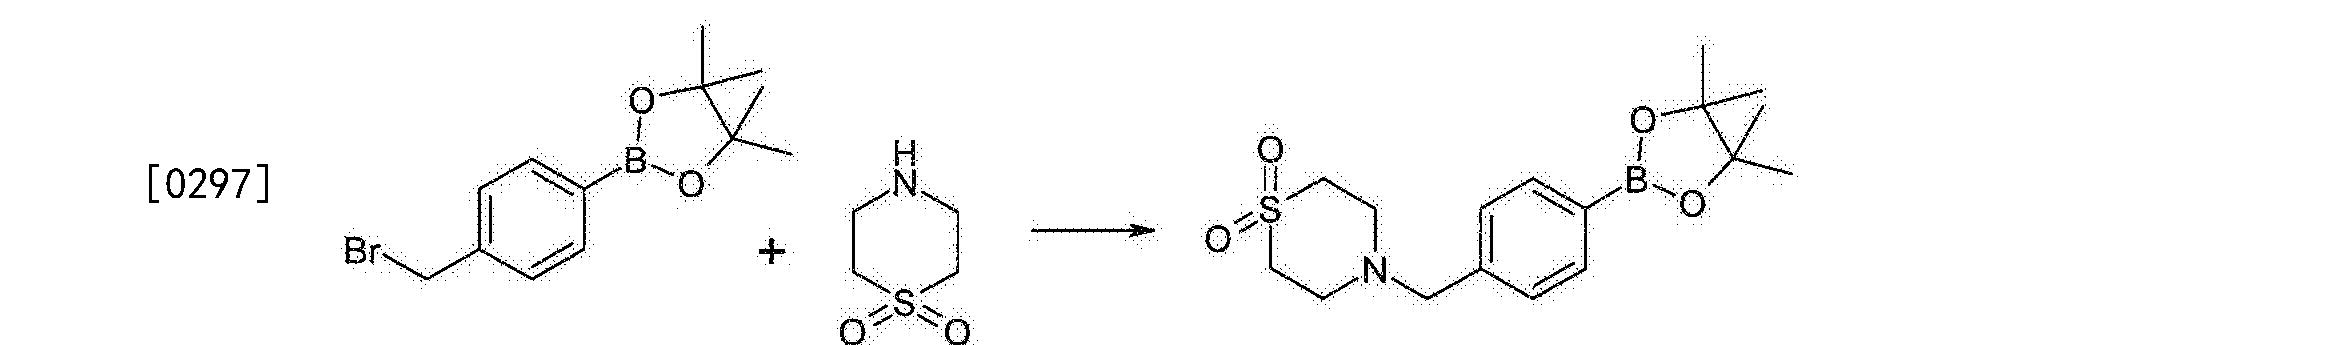 Figure CN105960407AD00332